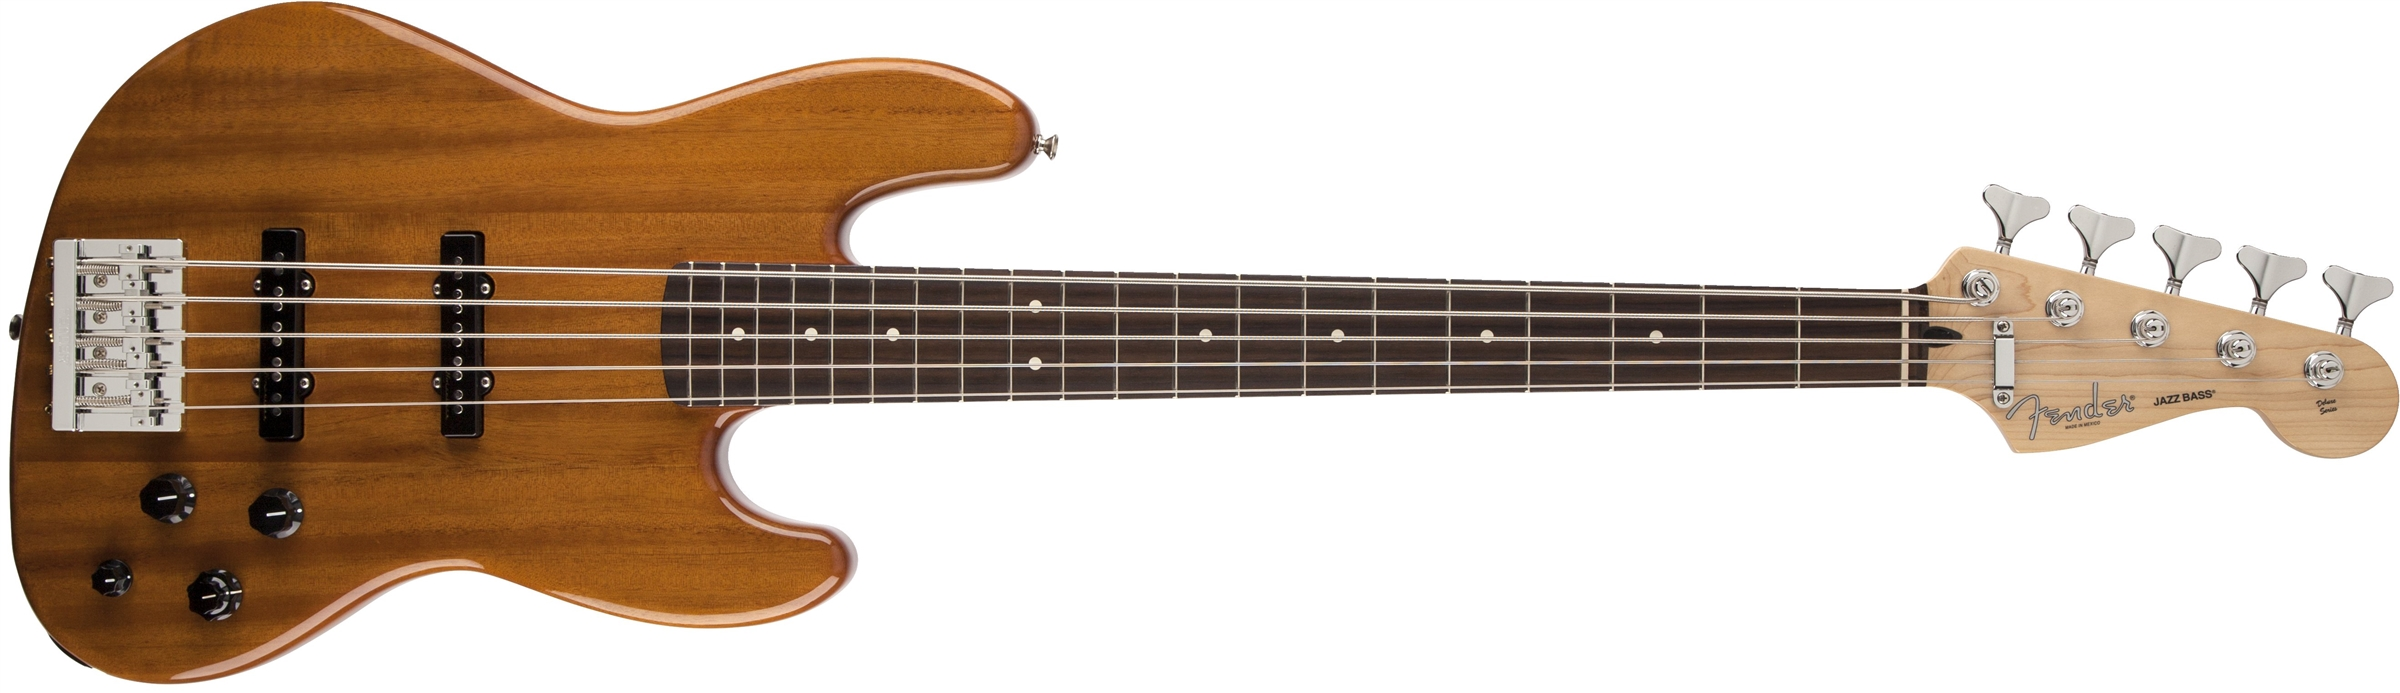 Deluxe Active Jazz Bass V Okoume 2015 2016 Deluxe Active Jazz Bass V Okoume 2015 2016